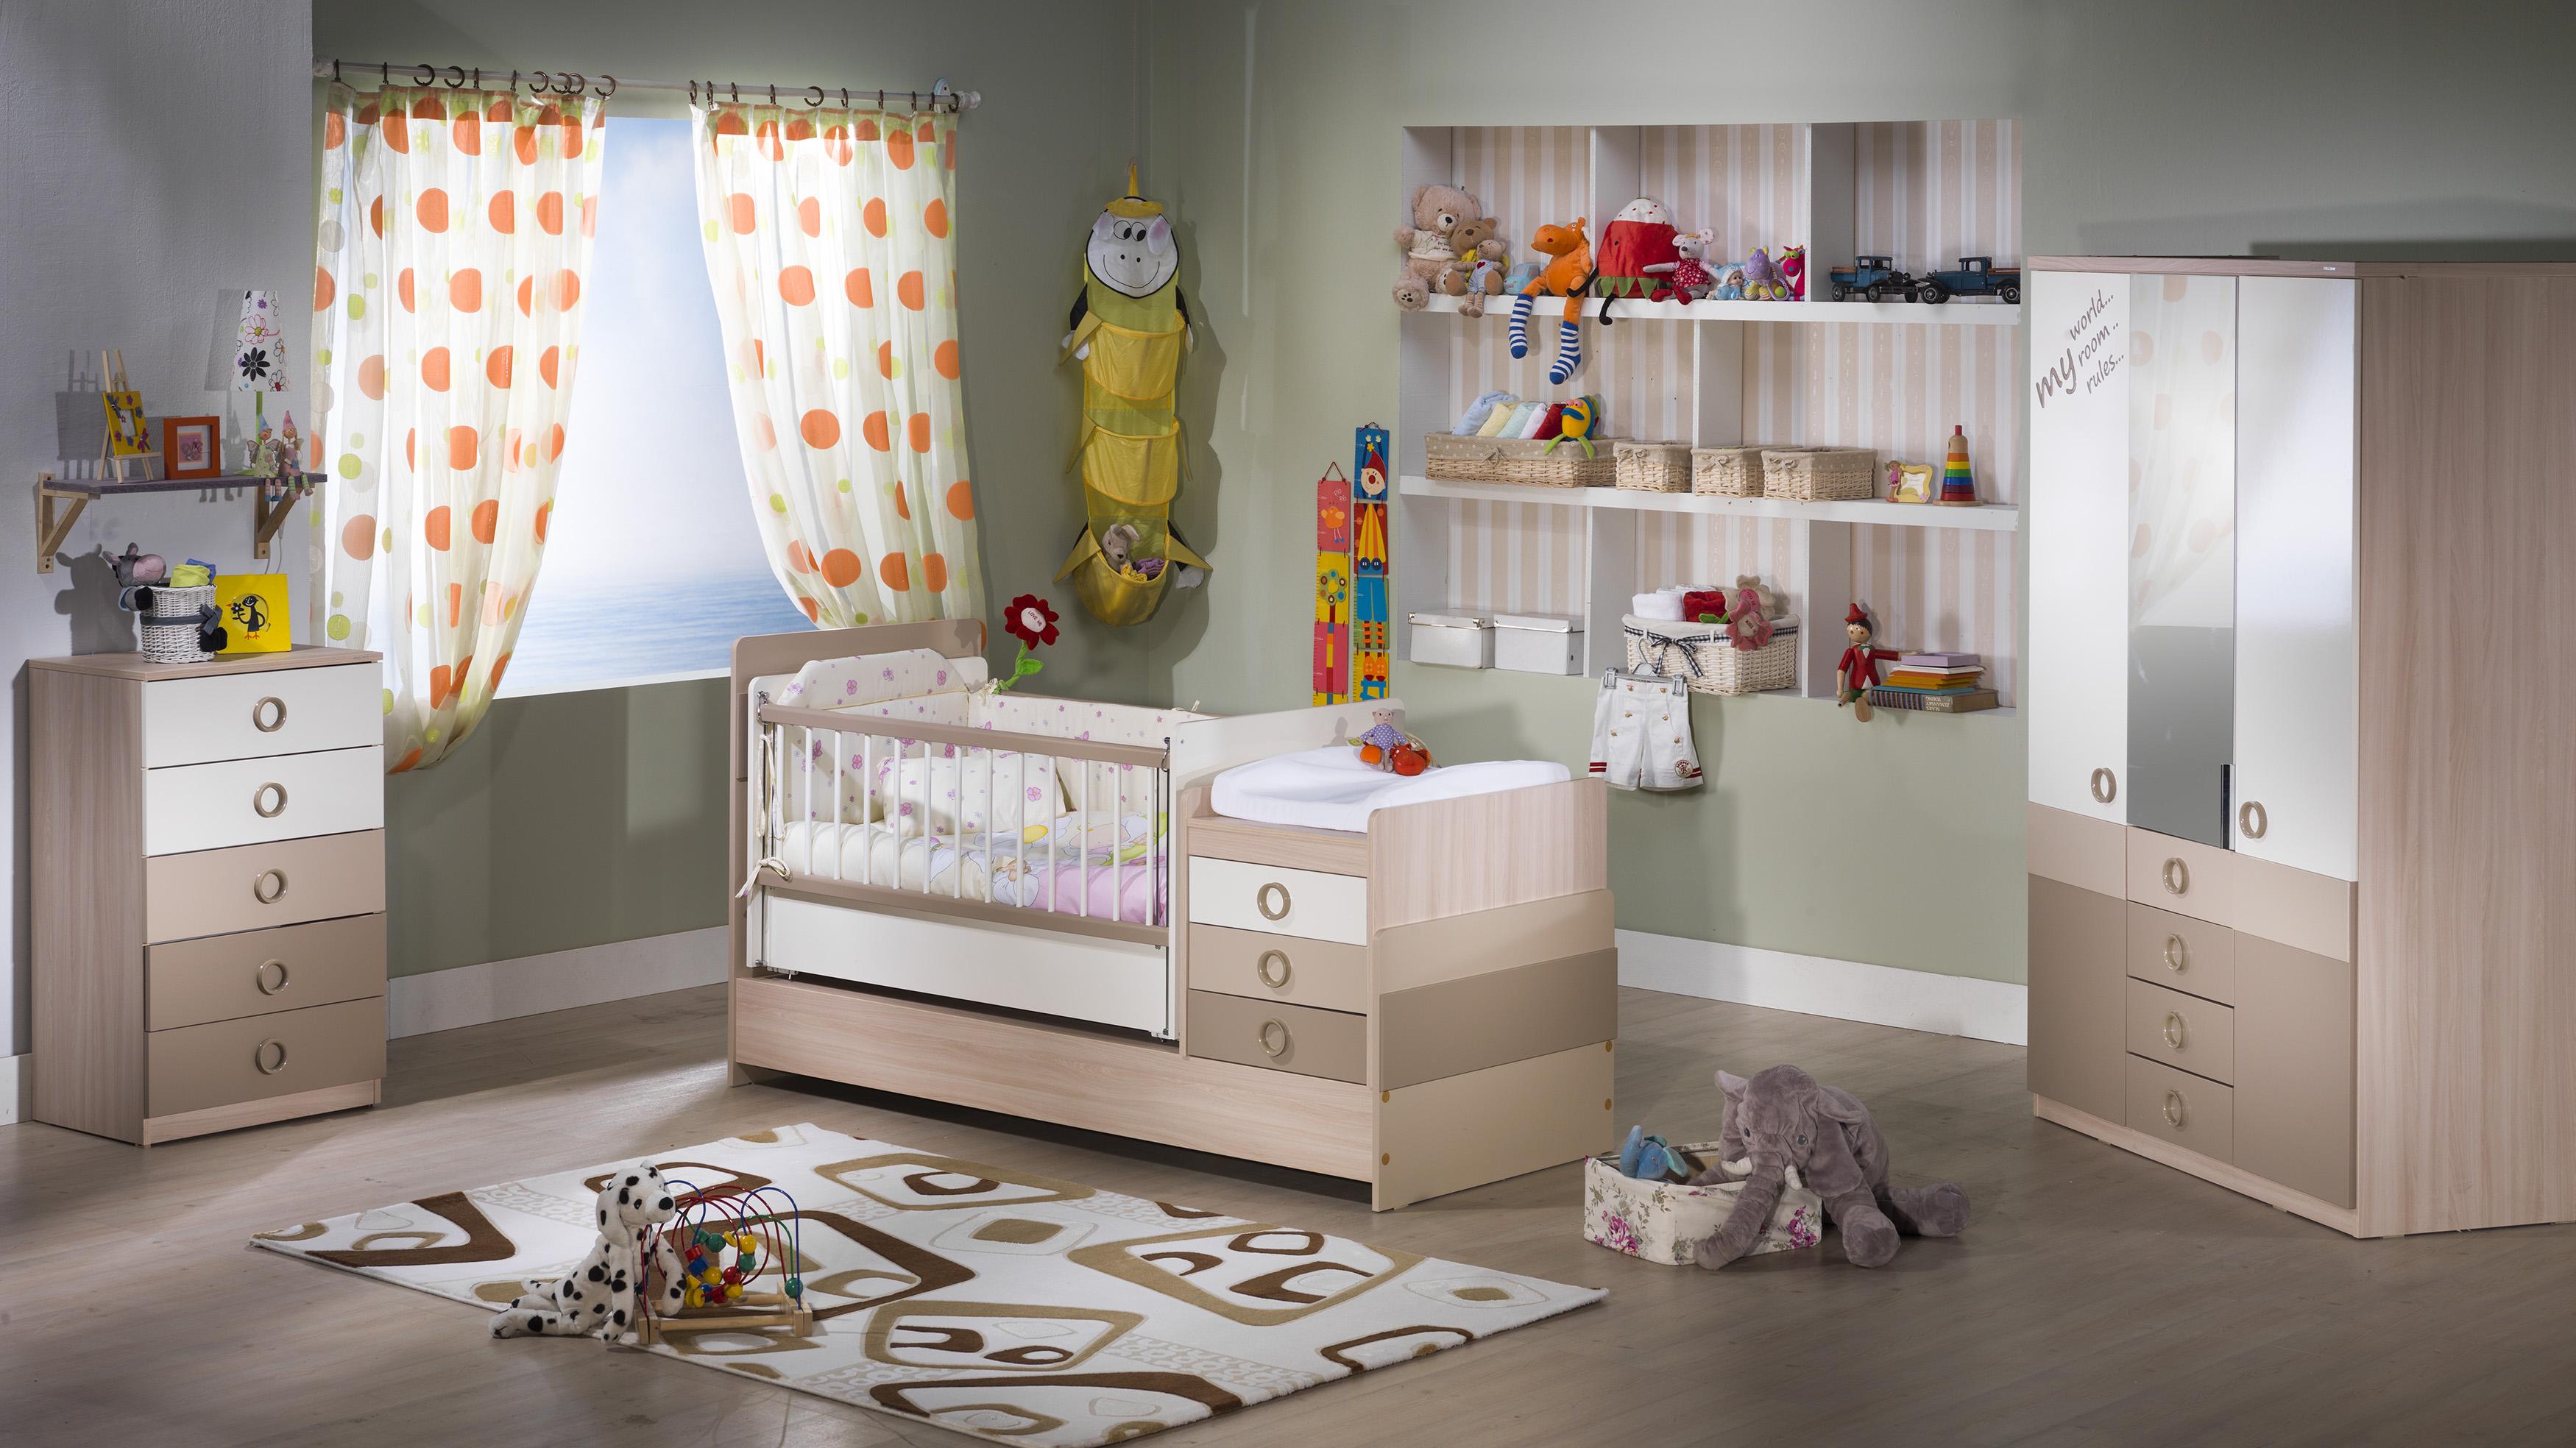 Portivo chambre enfant-2